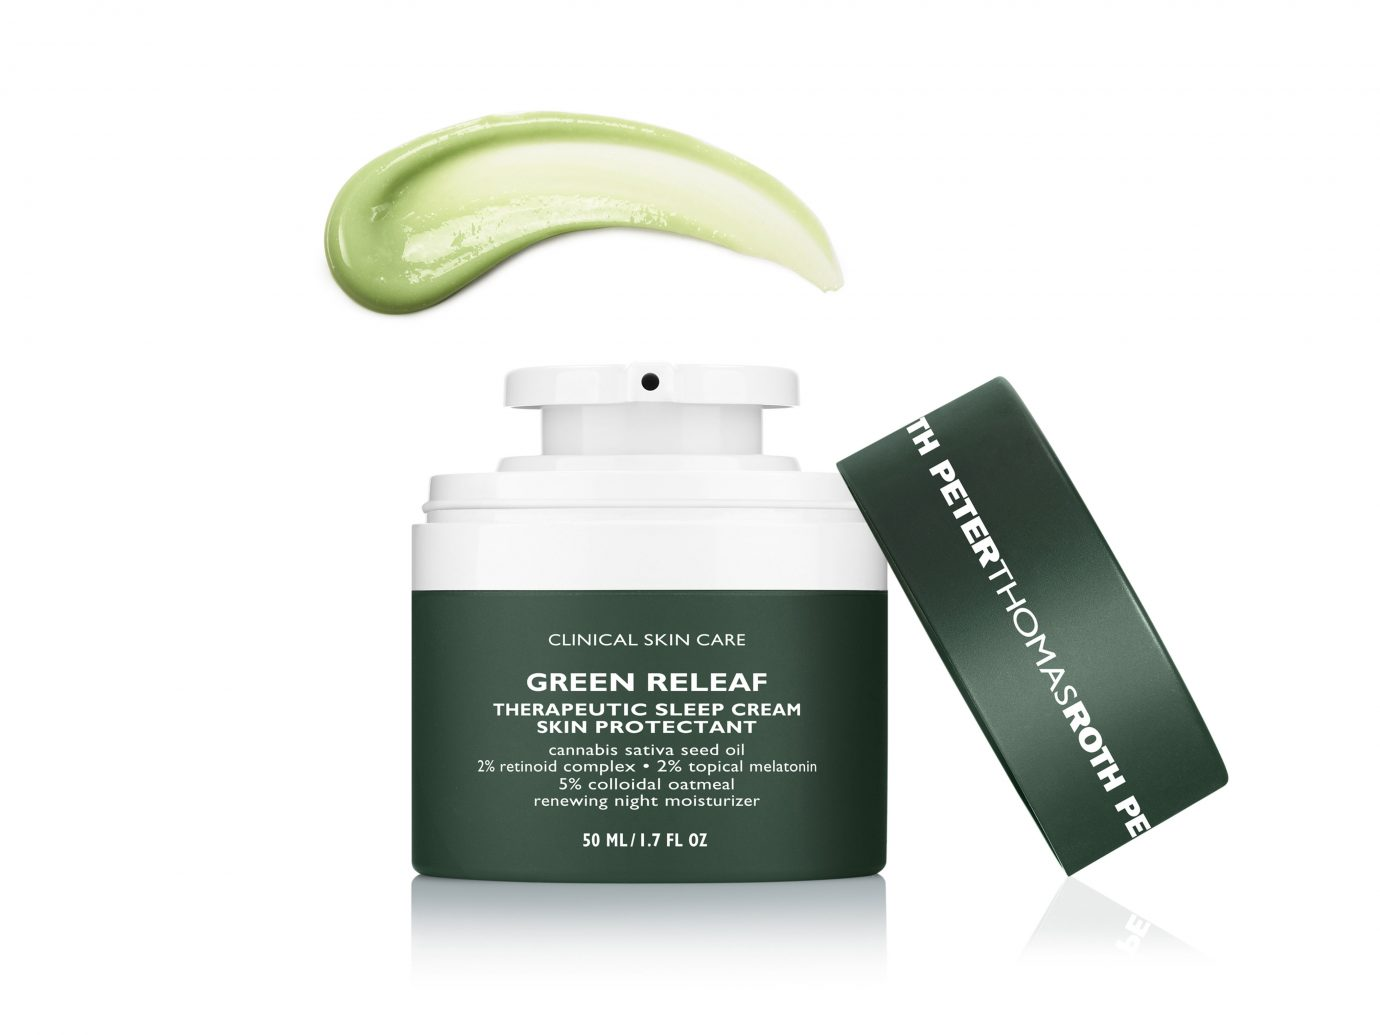 Green Releaf Therapeutic Sleep Cream